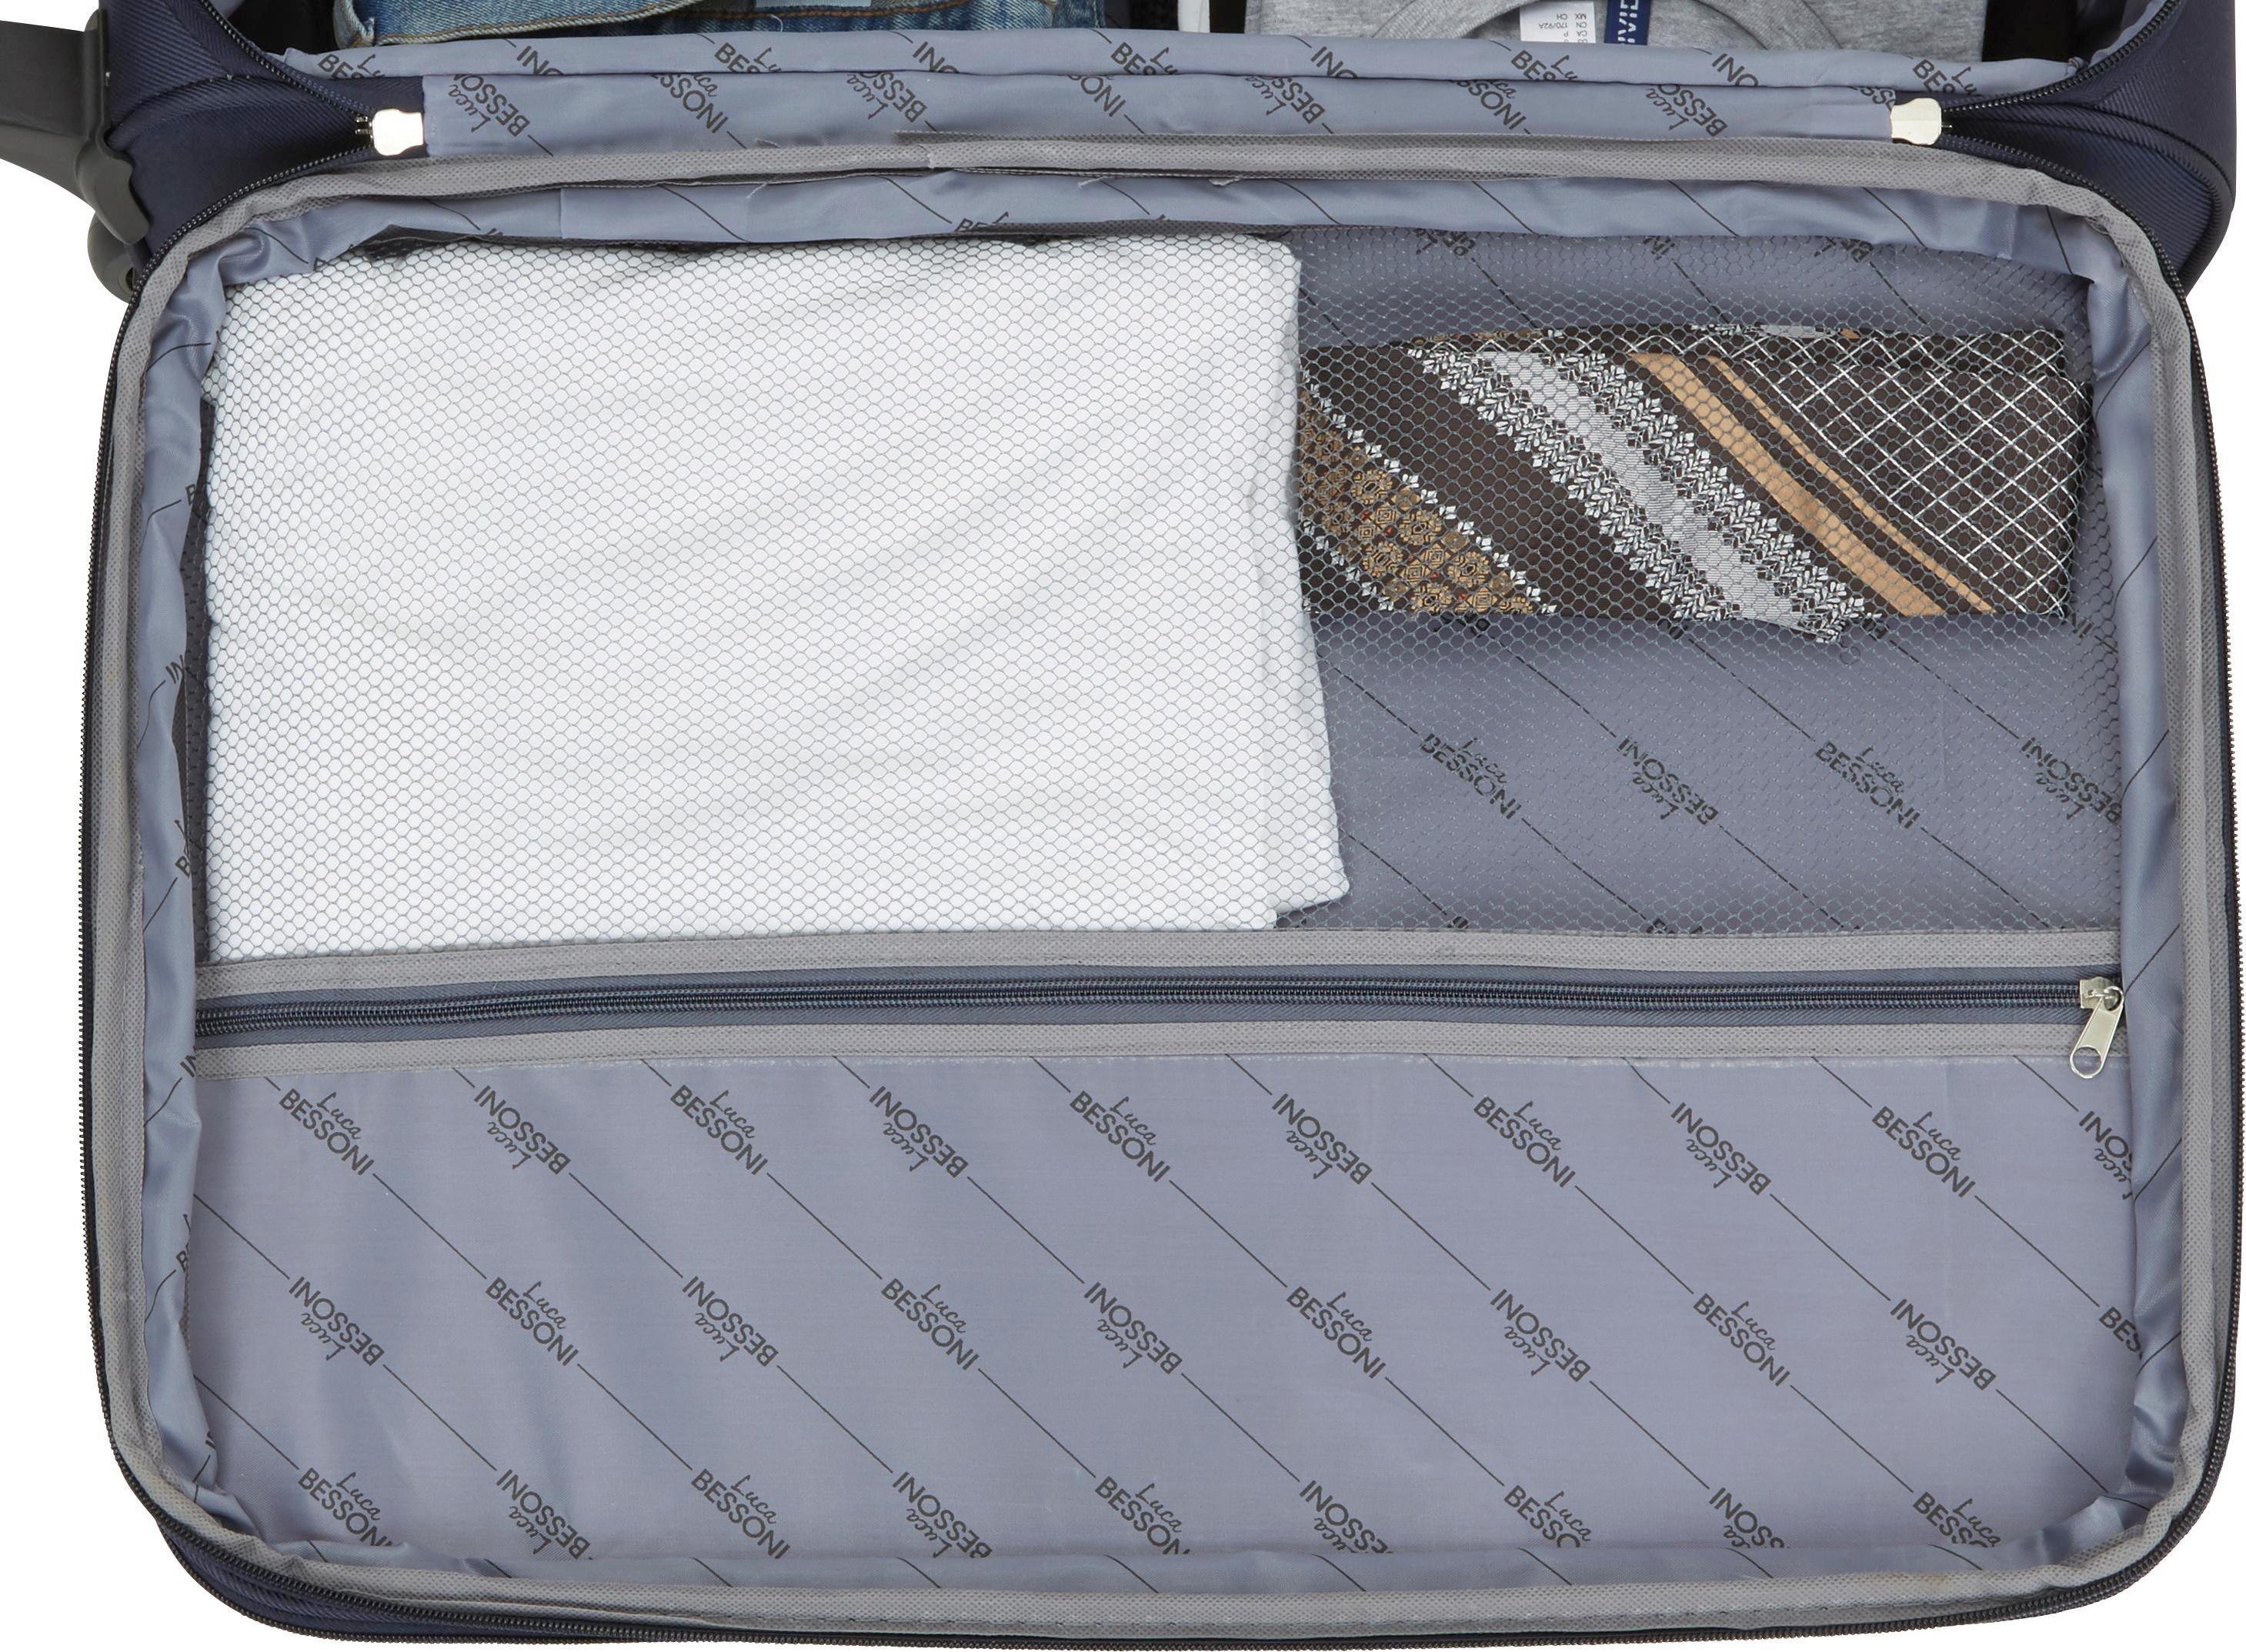 Reisekofferset Jesolo - Blau, KONVENTIONELL, Textil/Metall - LUCA BESSONI